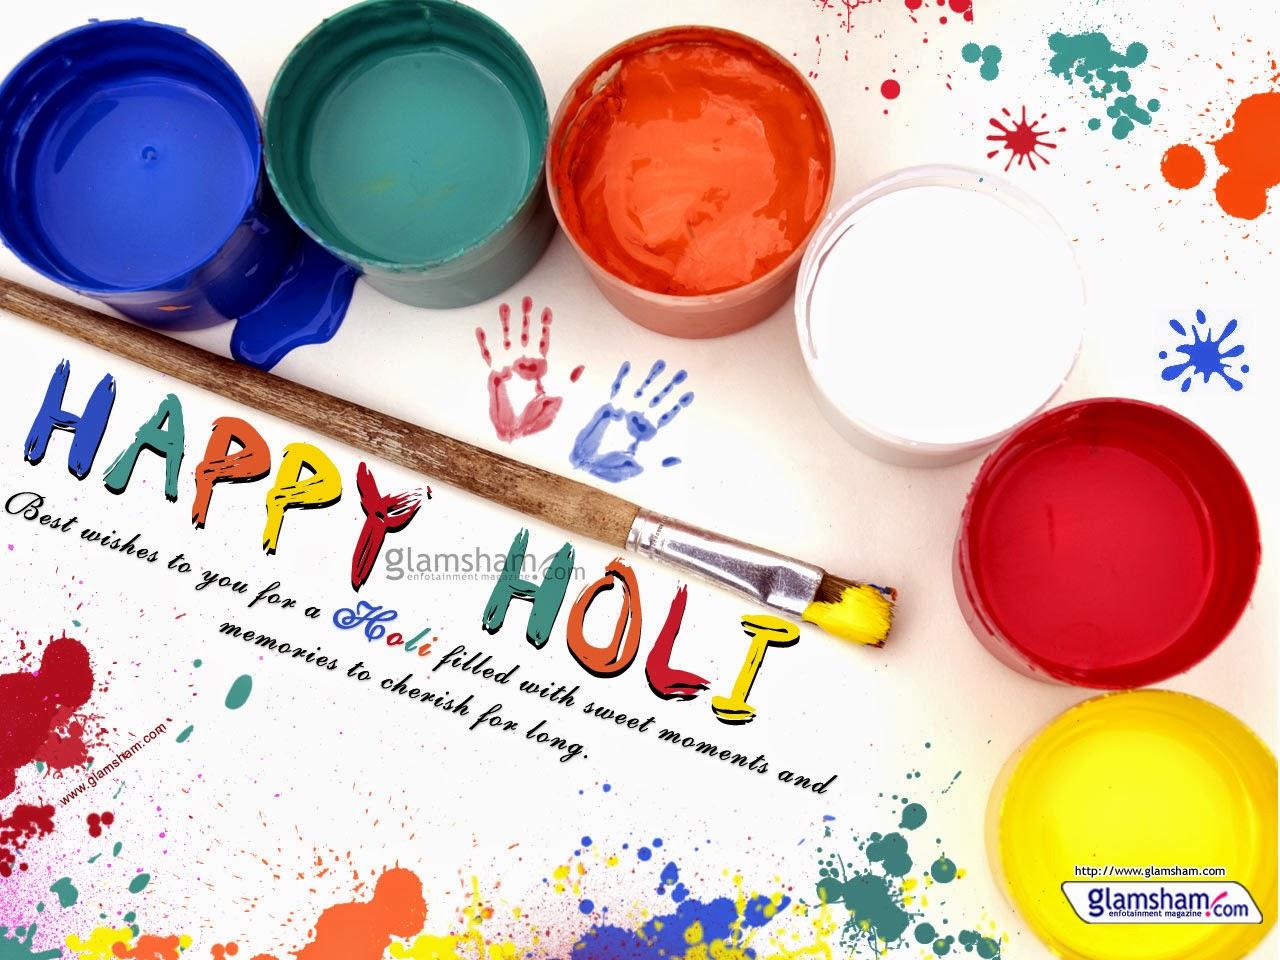 happy holi in advance wallpaper 2015